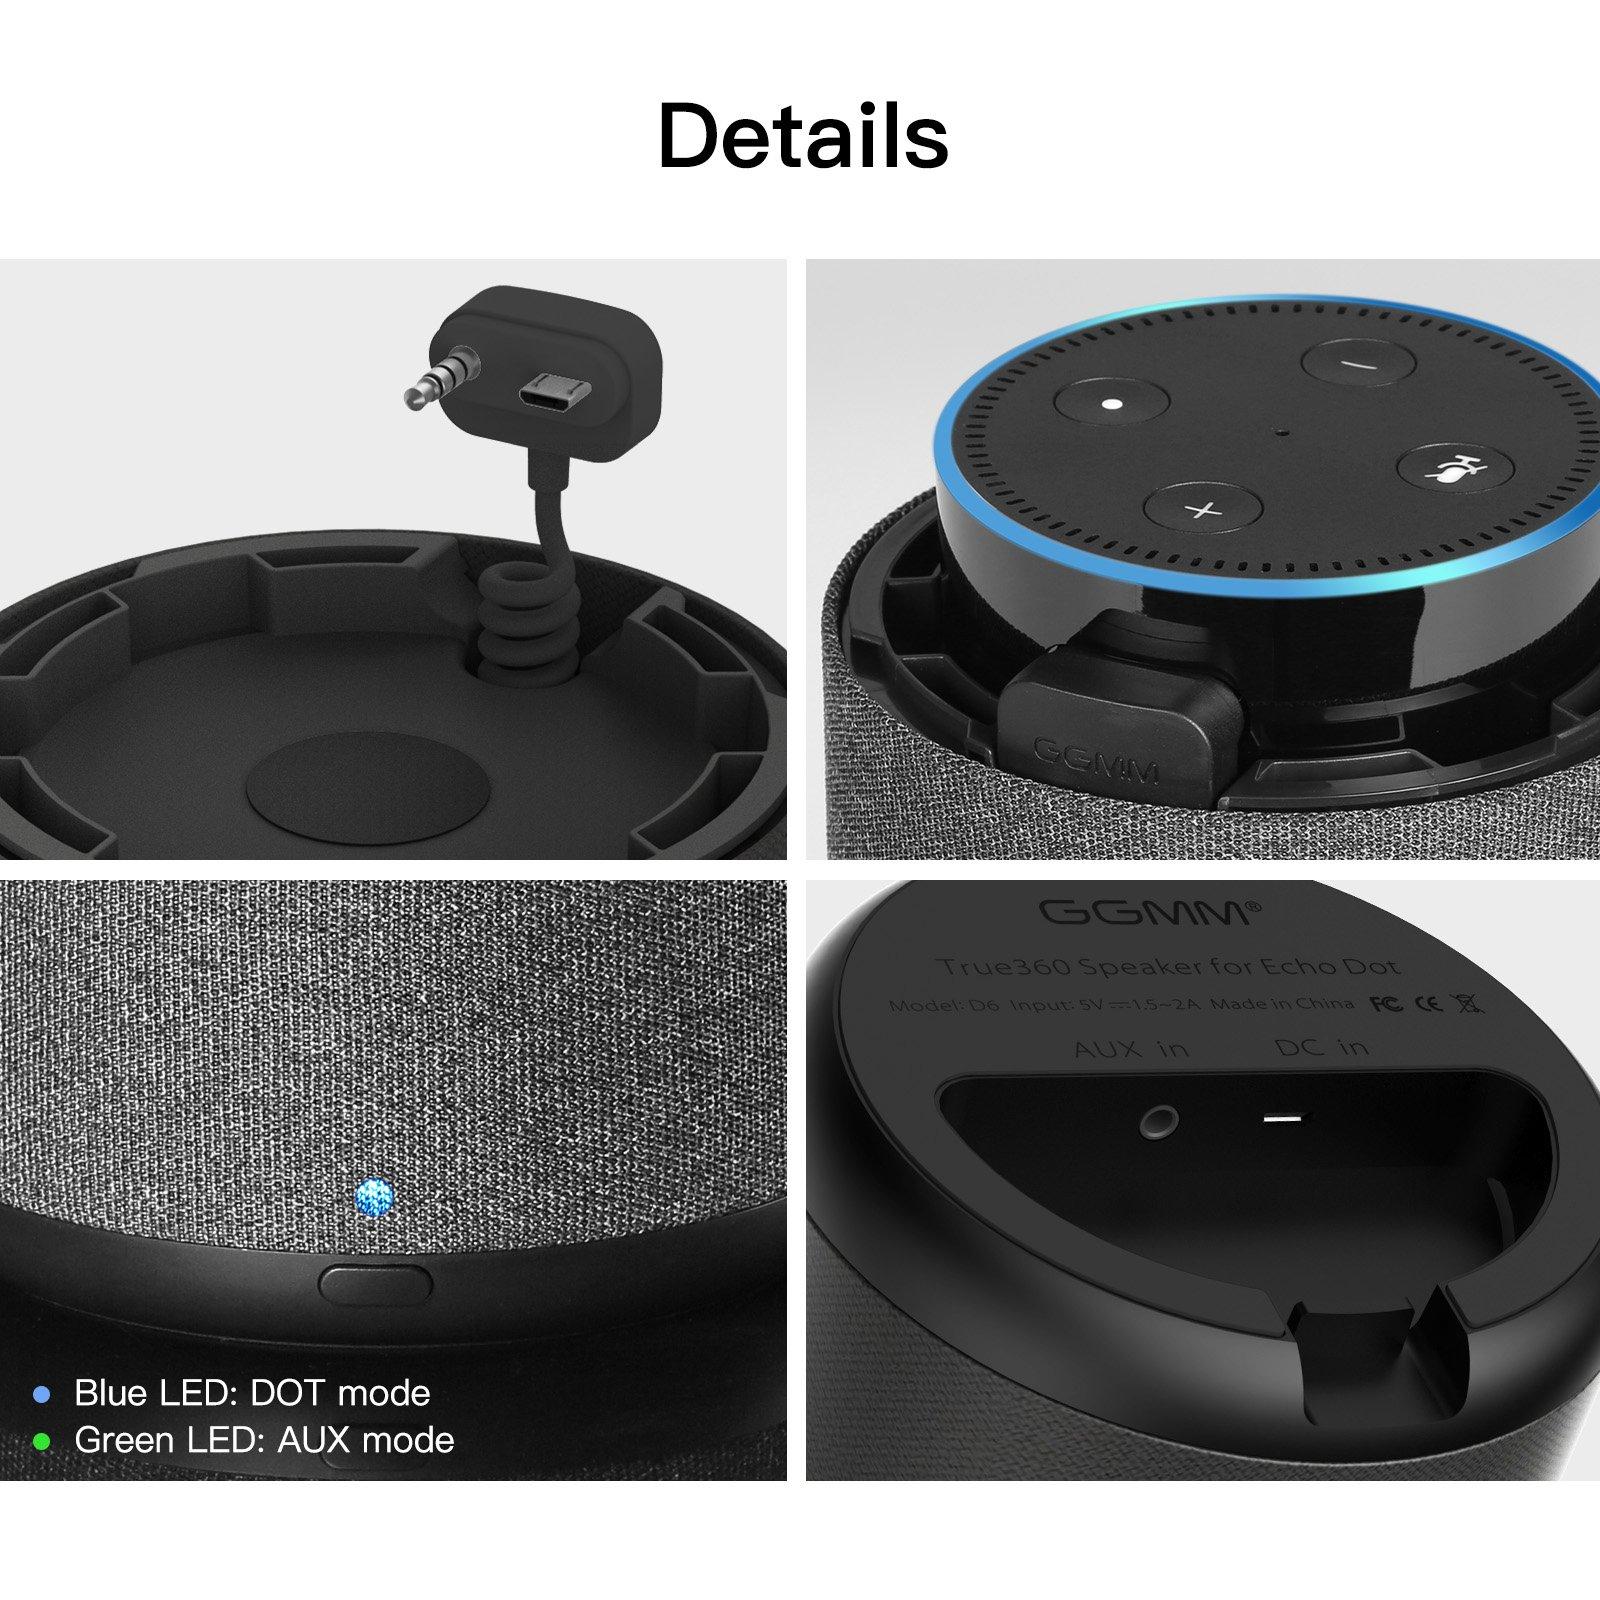 GGMM D6 Portable Speaker for Amazon Echo Dot 2nd Generation, 20W Powerful True 360 Alexa Speakers (DOT SOLD SEPARATELY) by GGMM (Image #5)